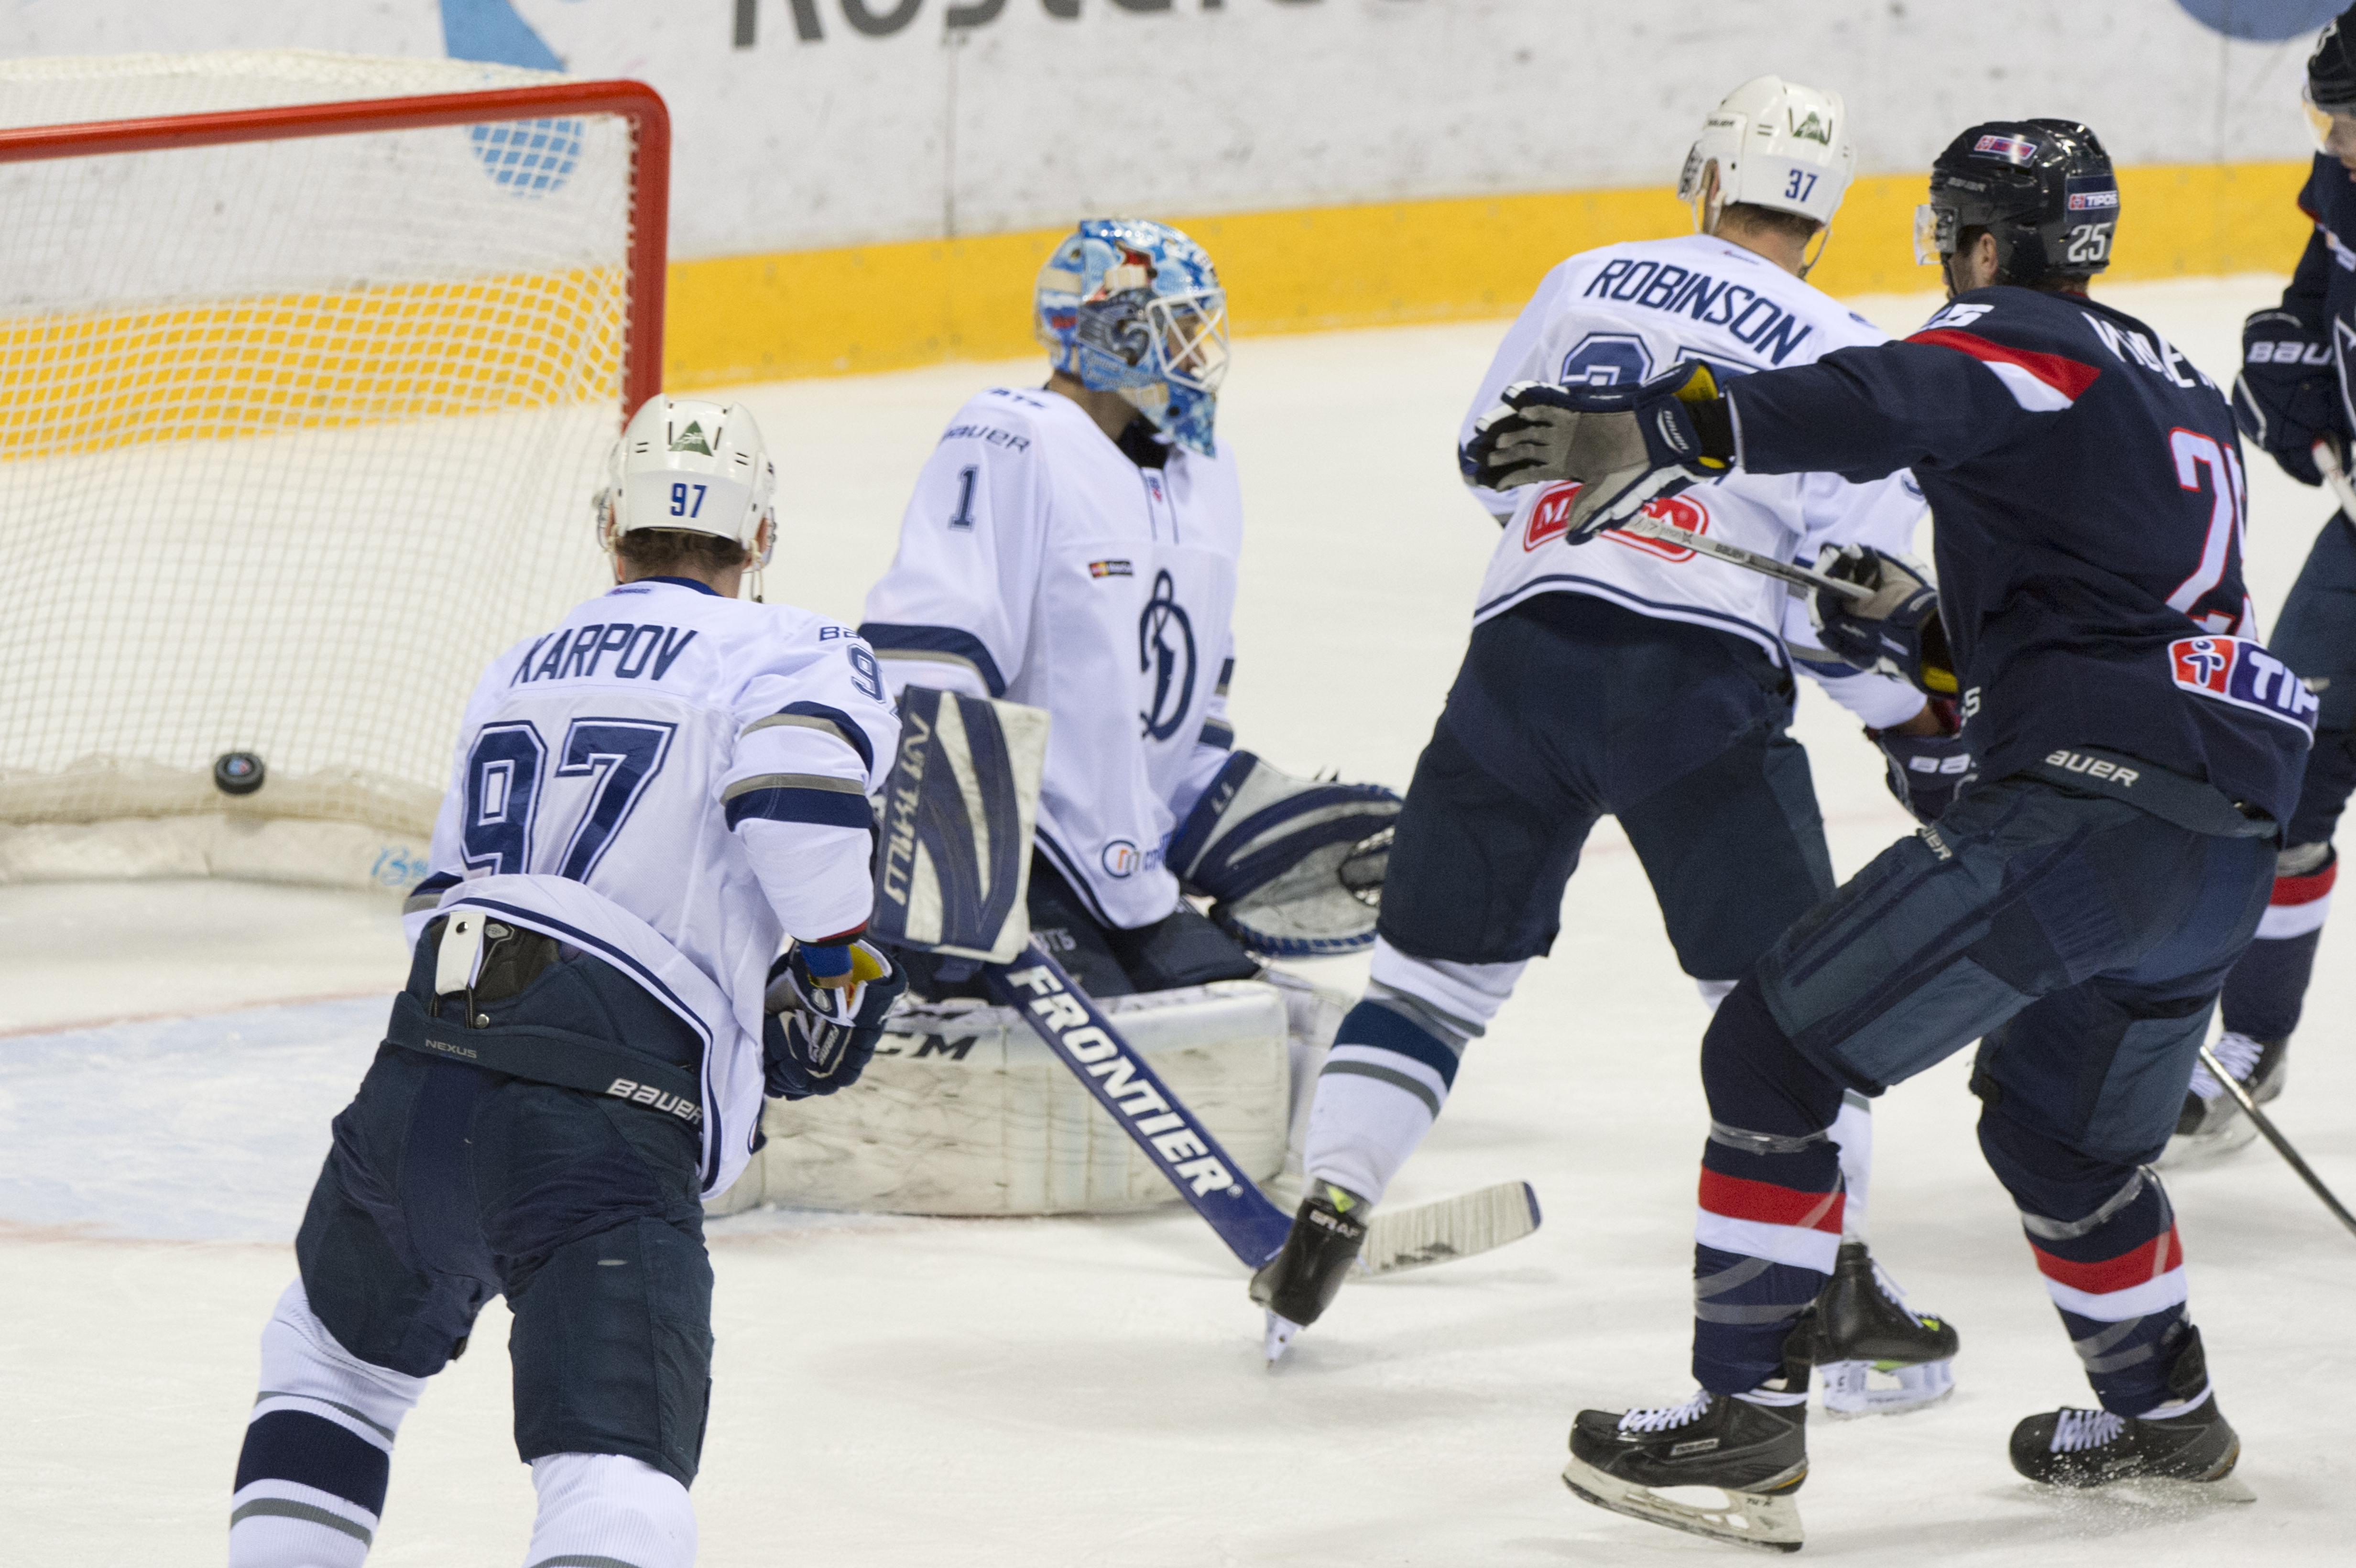 20150118_hokej2316741.jpg